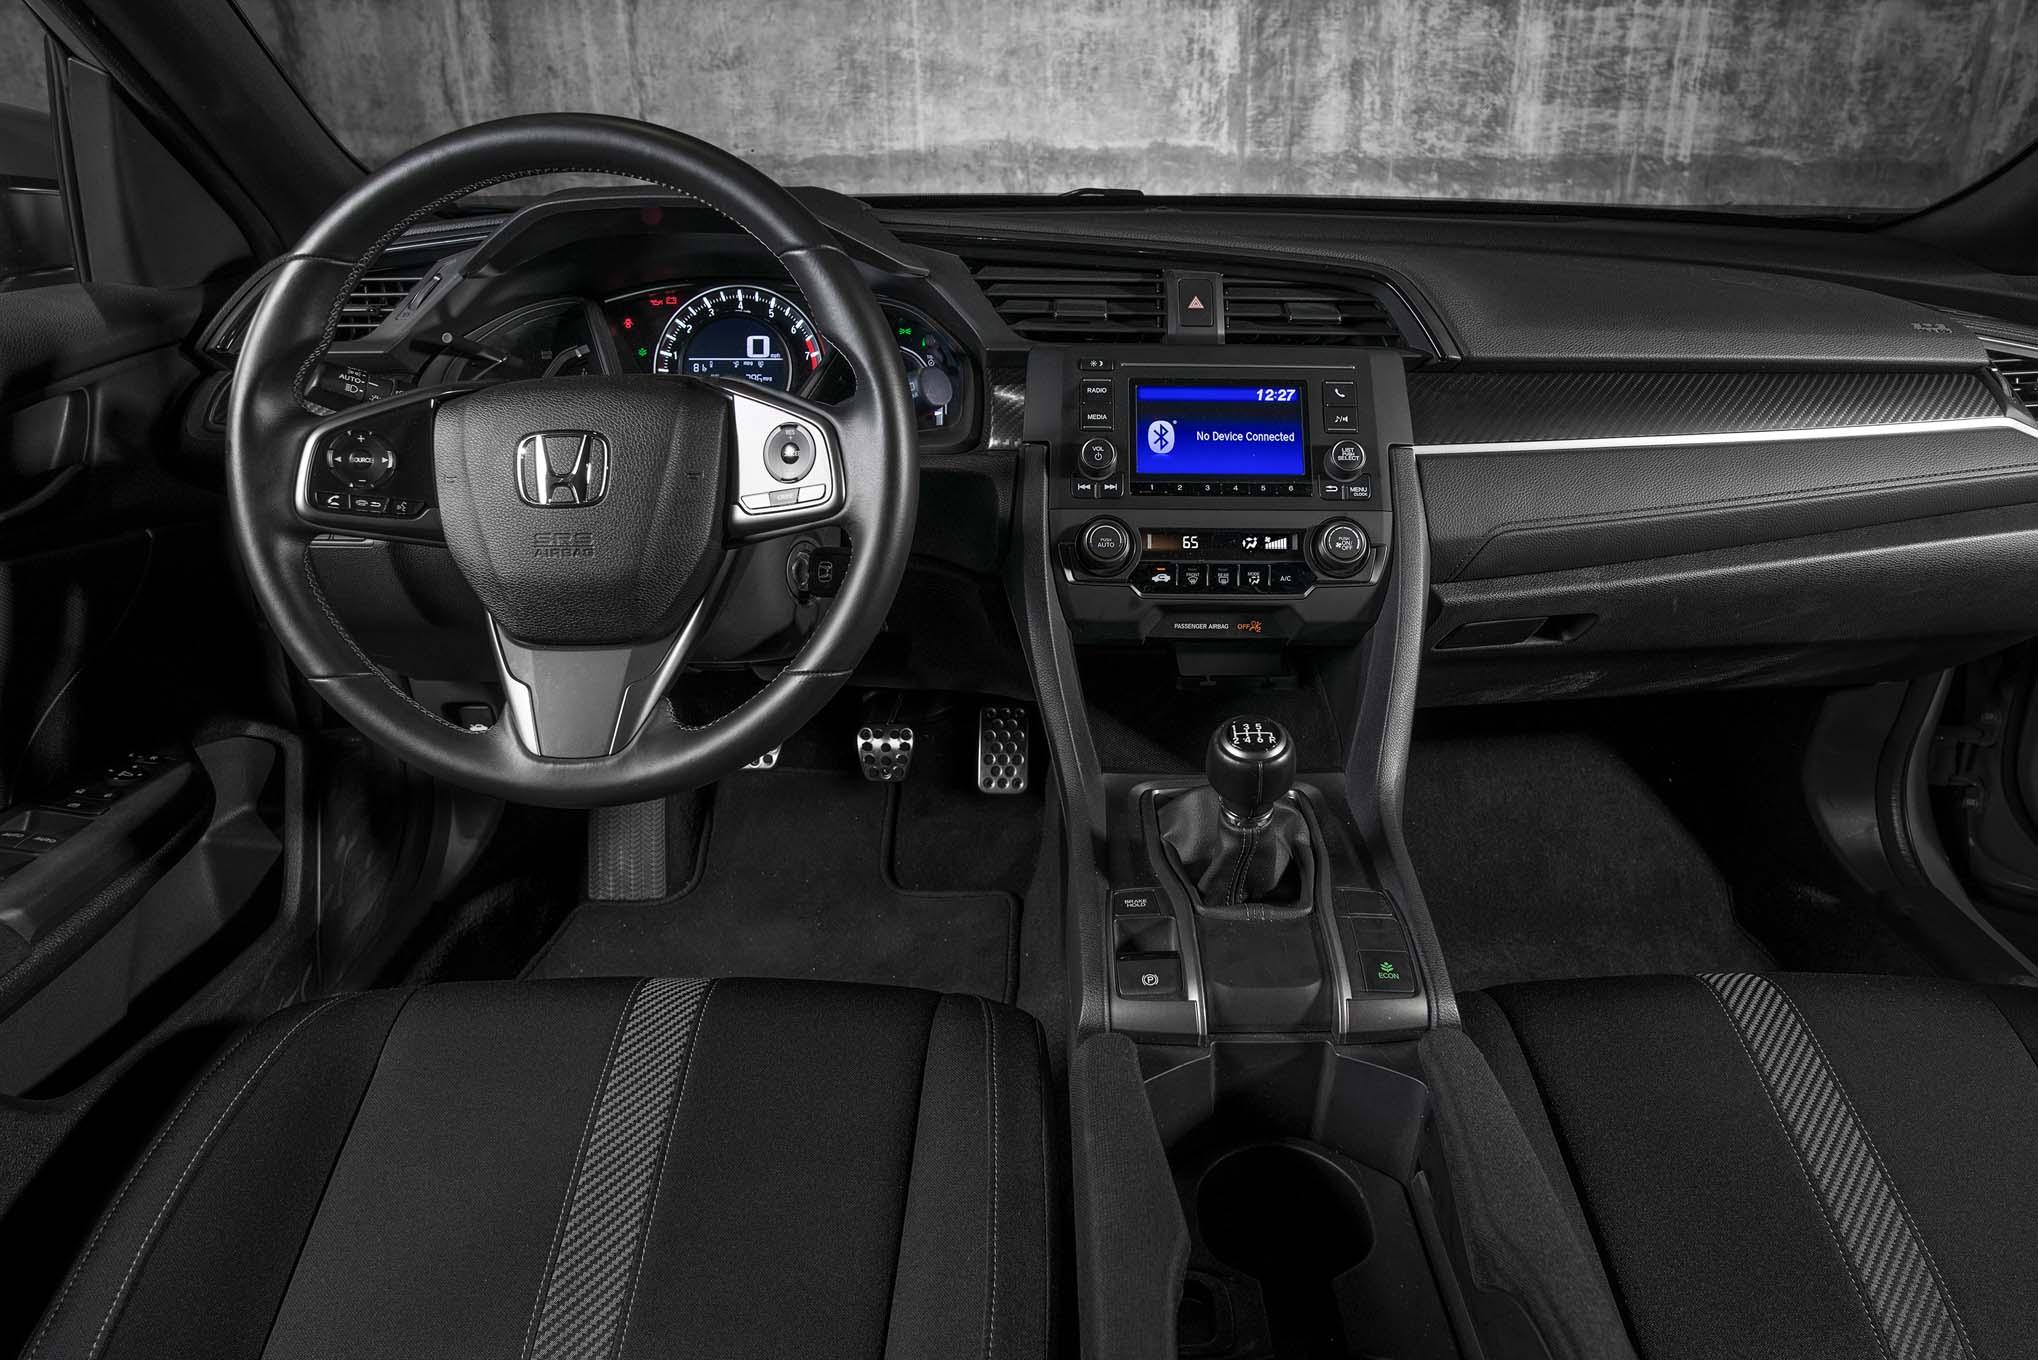 2017 Honda Civic Hatchback Sport Interior 21 Agosto Miguel Cortina